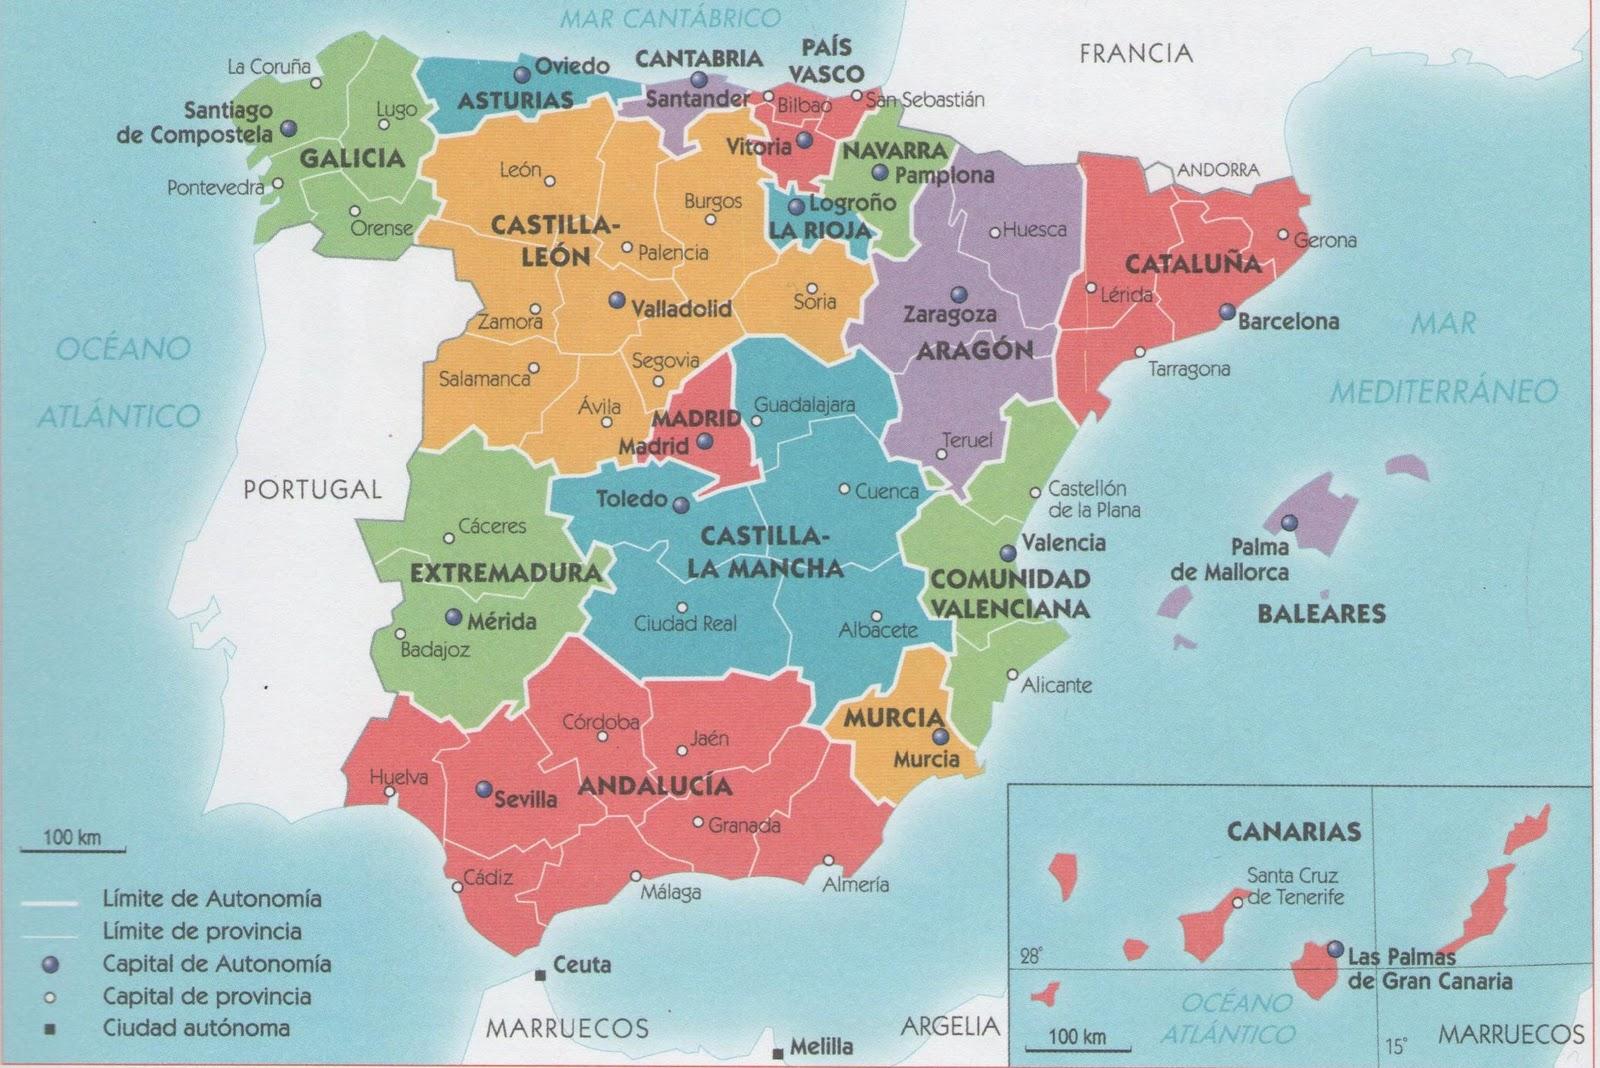 C mo pasar un buen fin de semana i el viaje y la investigaci n - Donde pasar un fin de semana romantico en espana ...